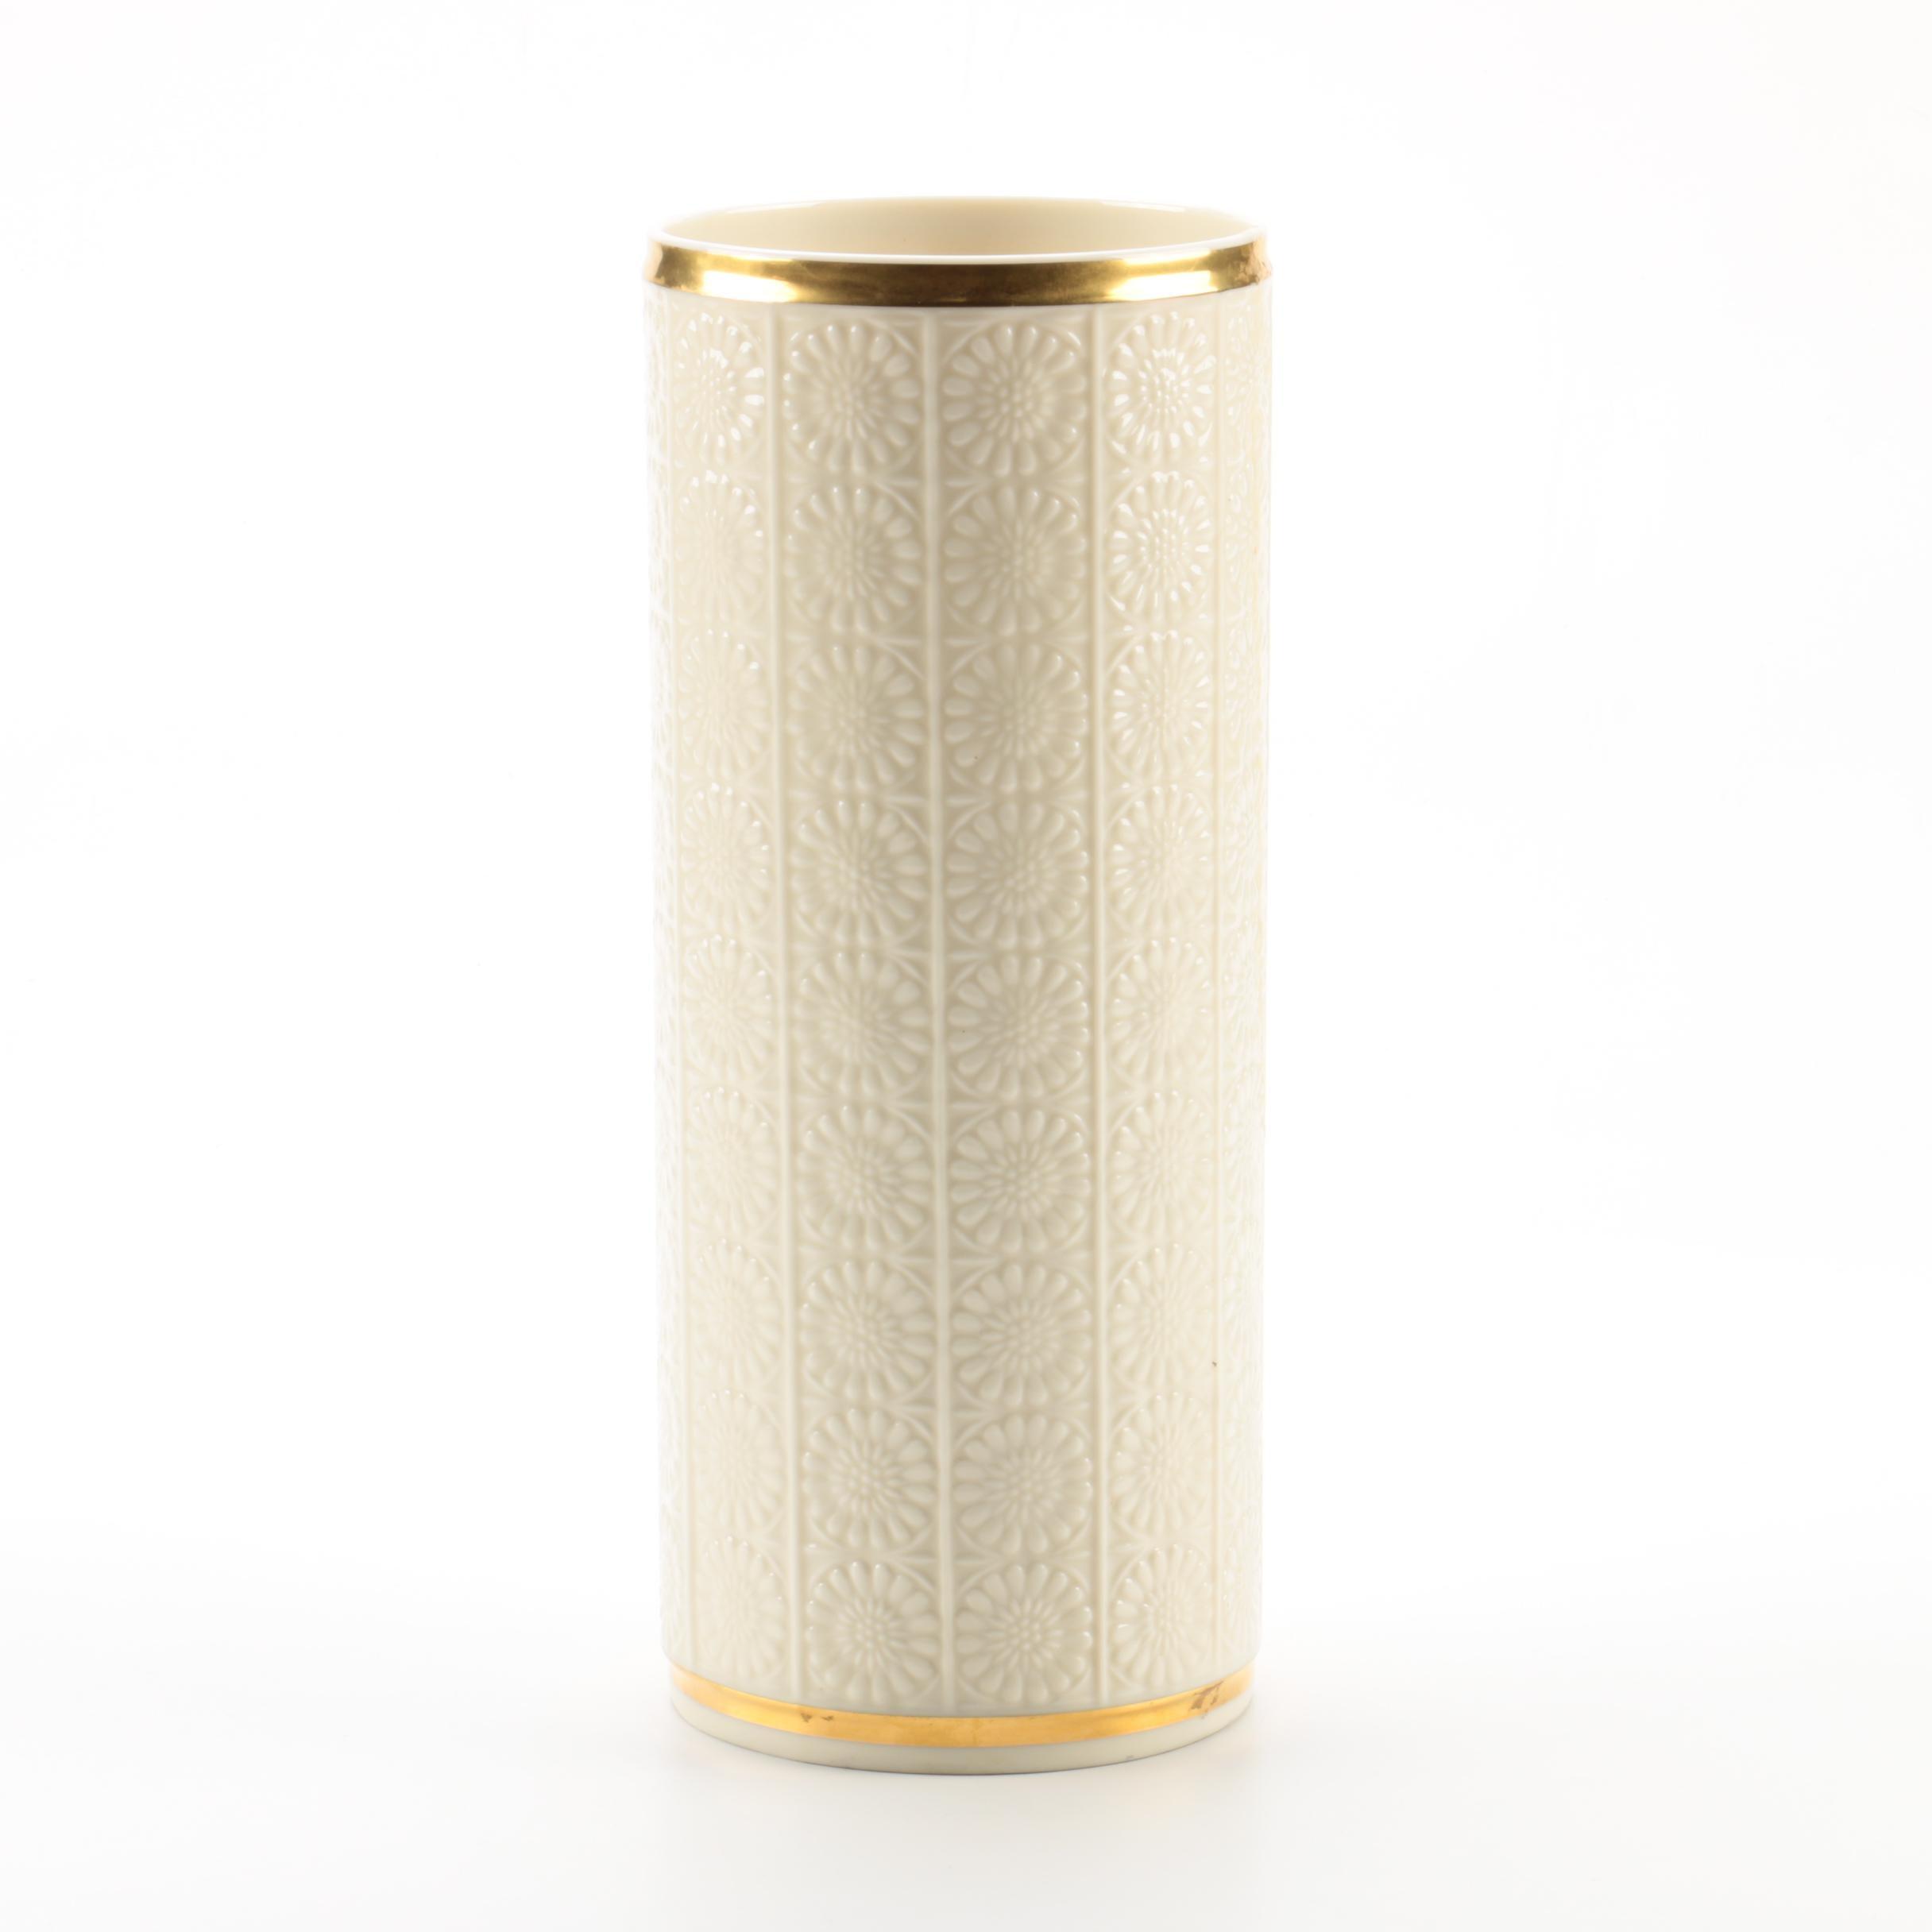 Lenox Hand Decorated Porcelain Vase with 24 Karat Gold Accents